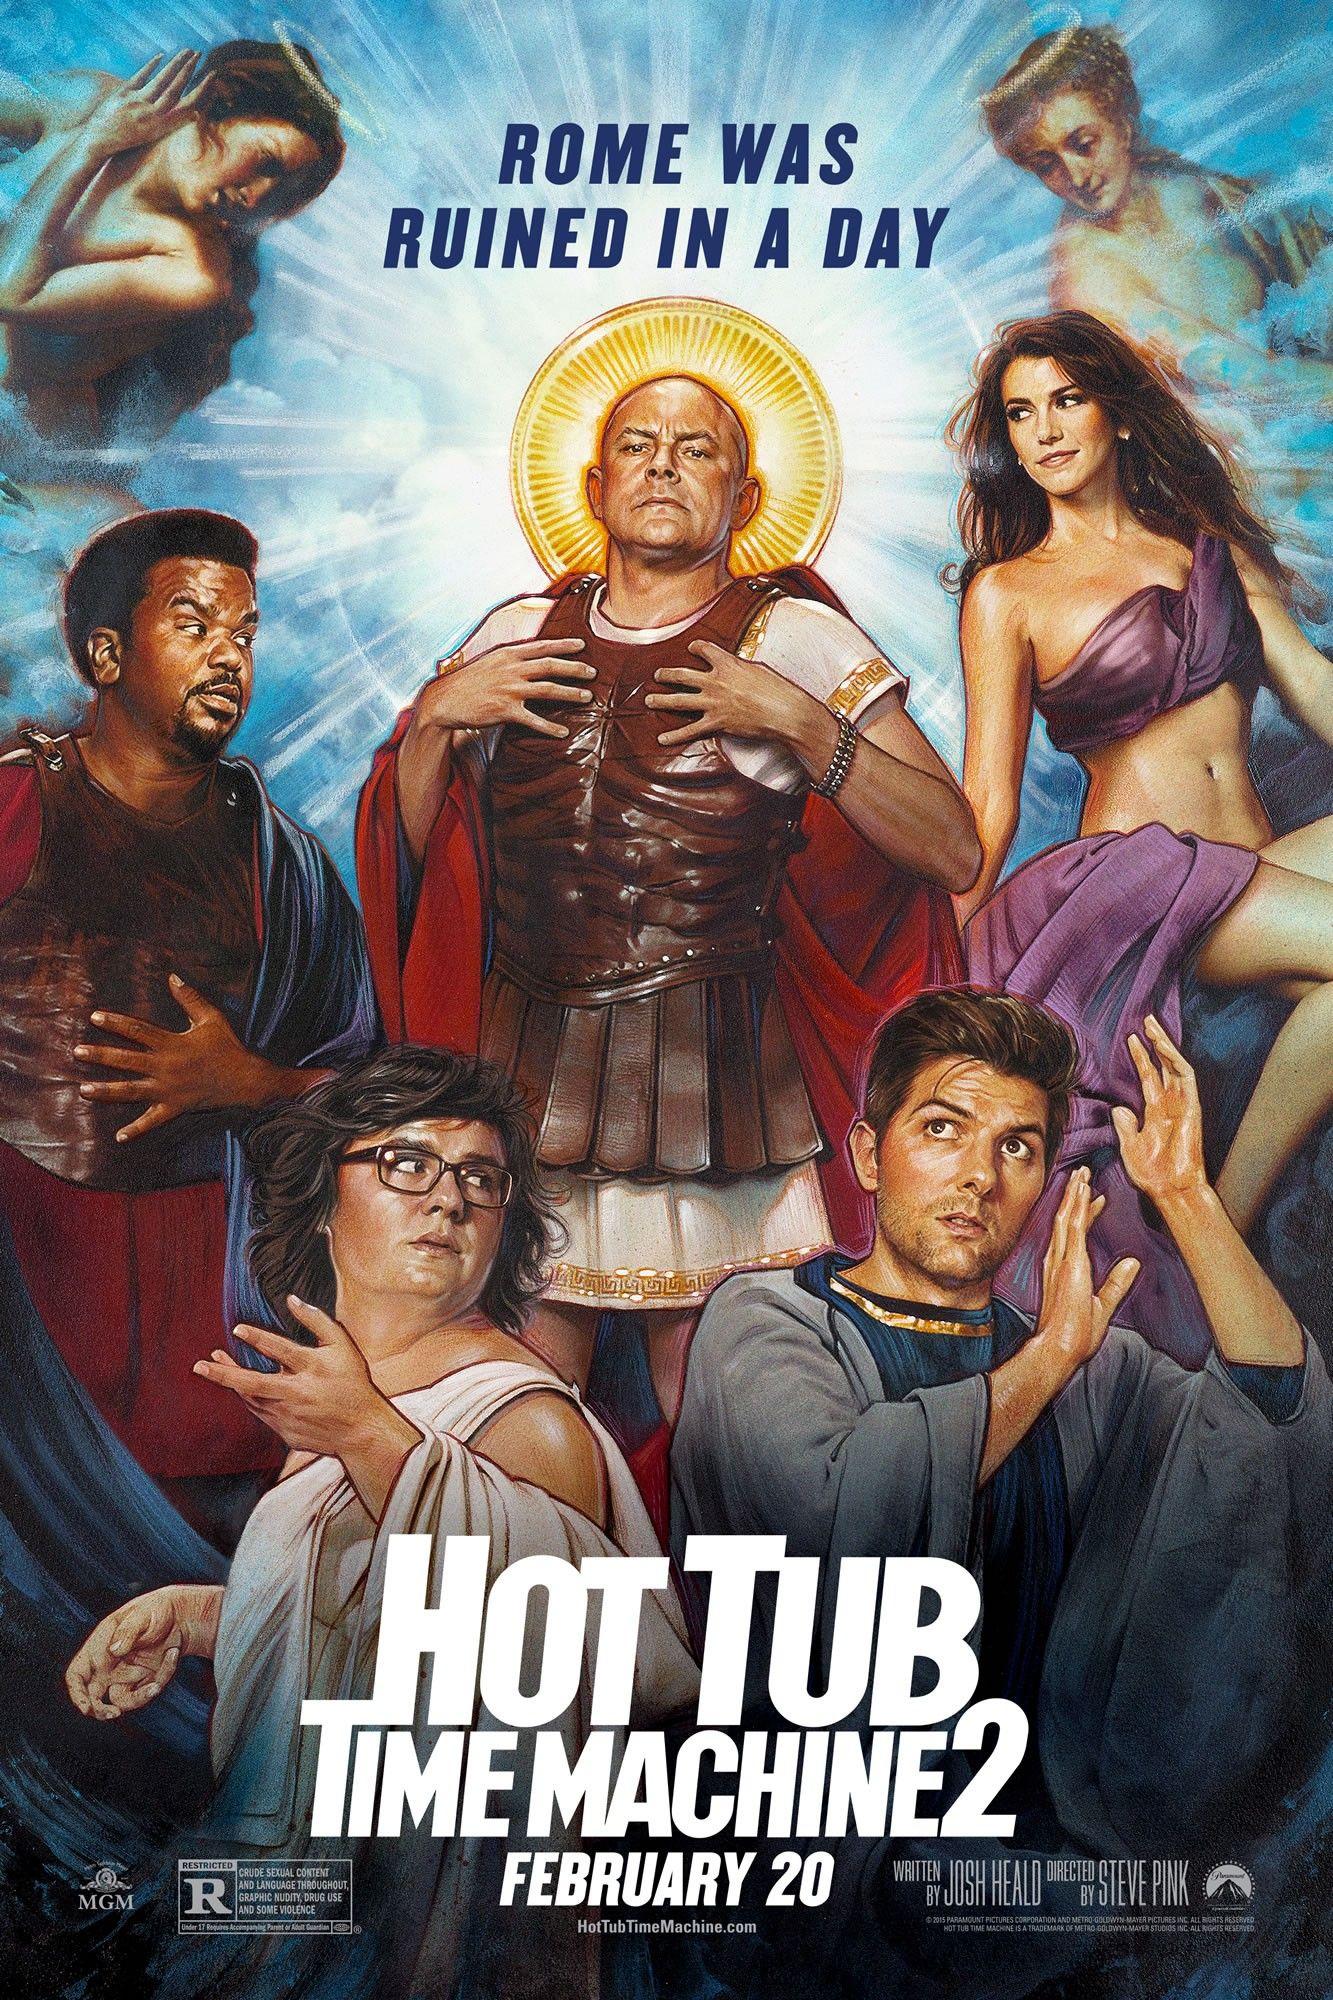 090 Hot Tub Time Machine 2 Jun 13th Hot Tub Time Machine